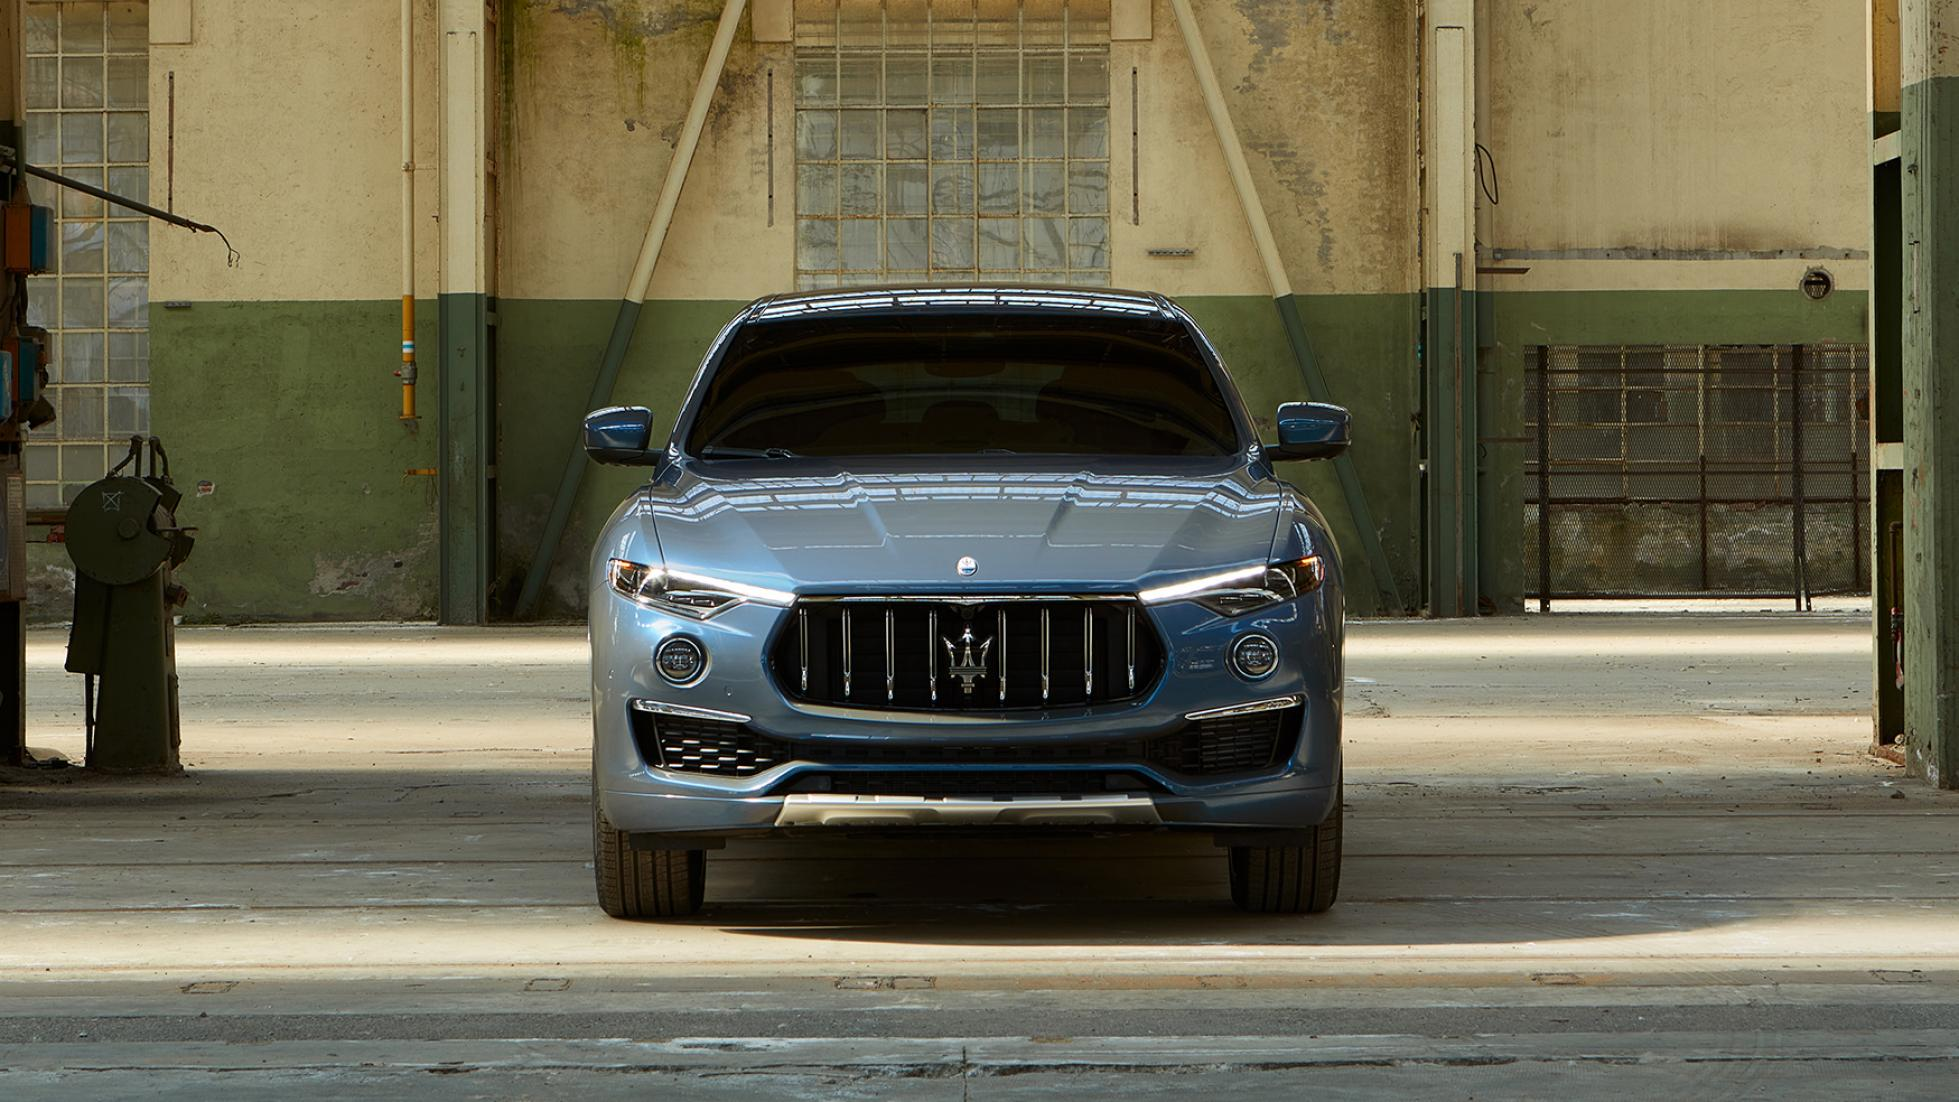 The Maserati Levante Hybrid Front View